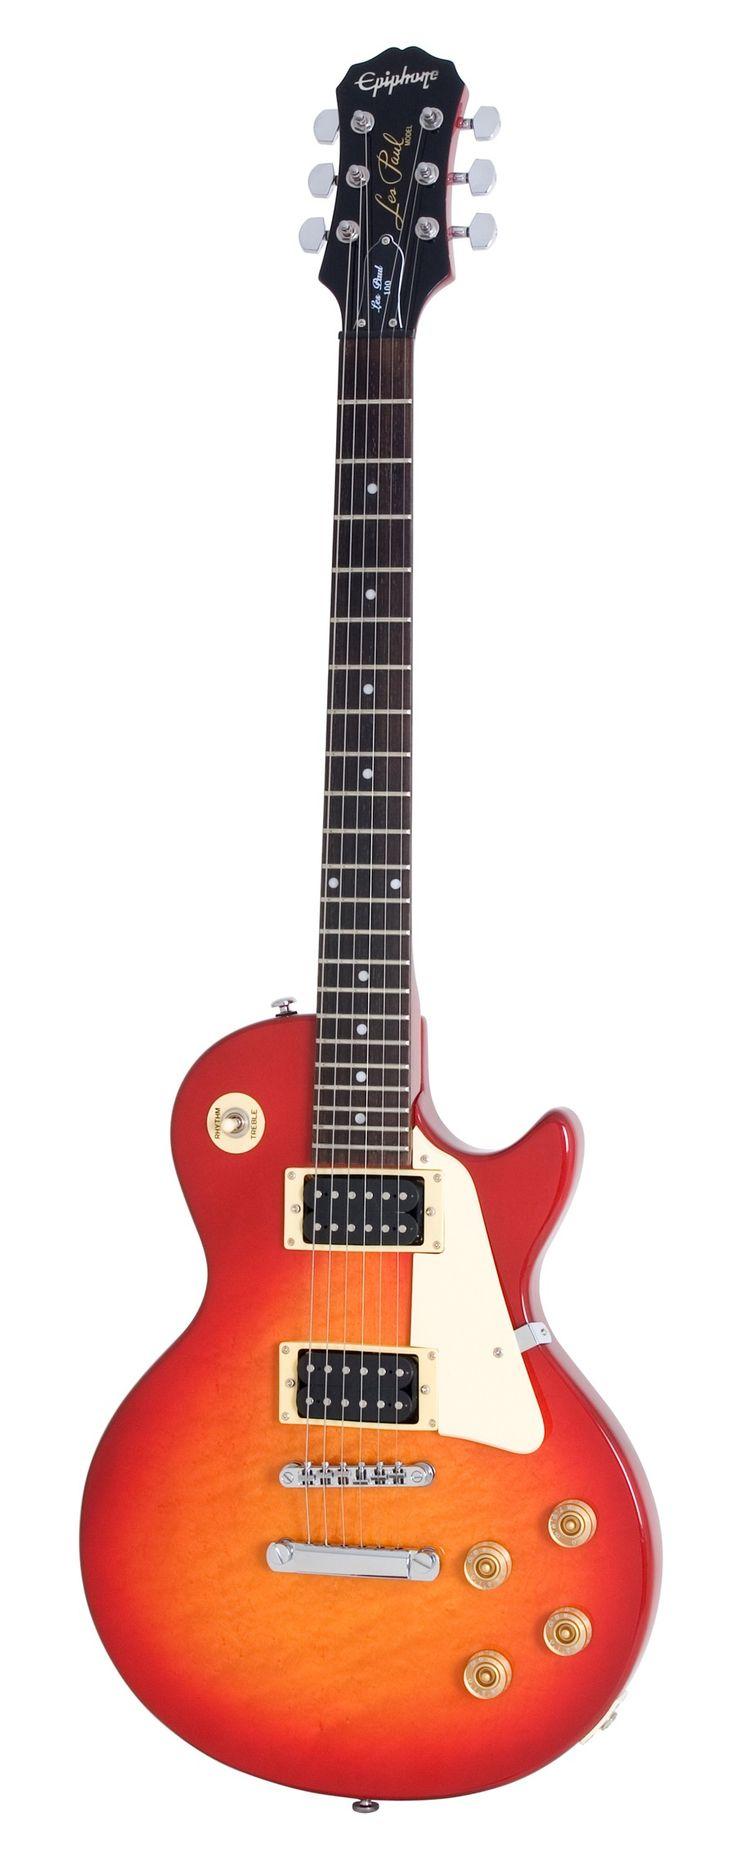 Epiphone Les Paul-100 Electric Guitar, Heritage Cherry Sunburst #epiphone #guitar